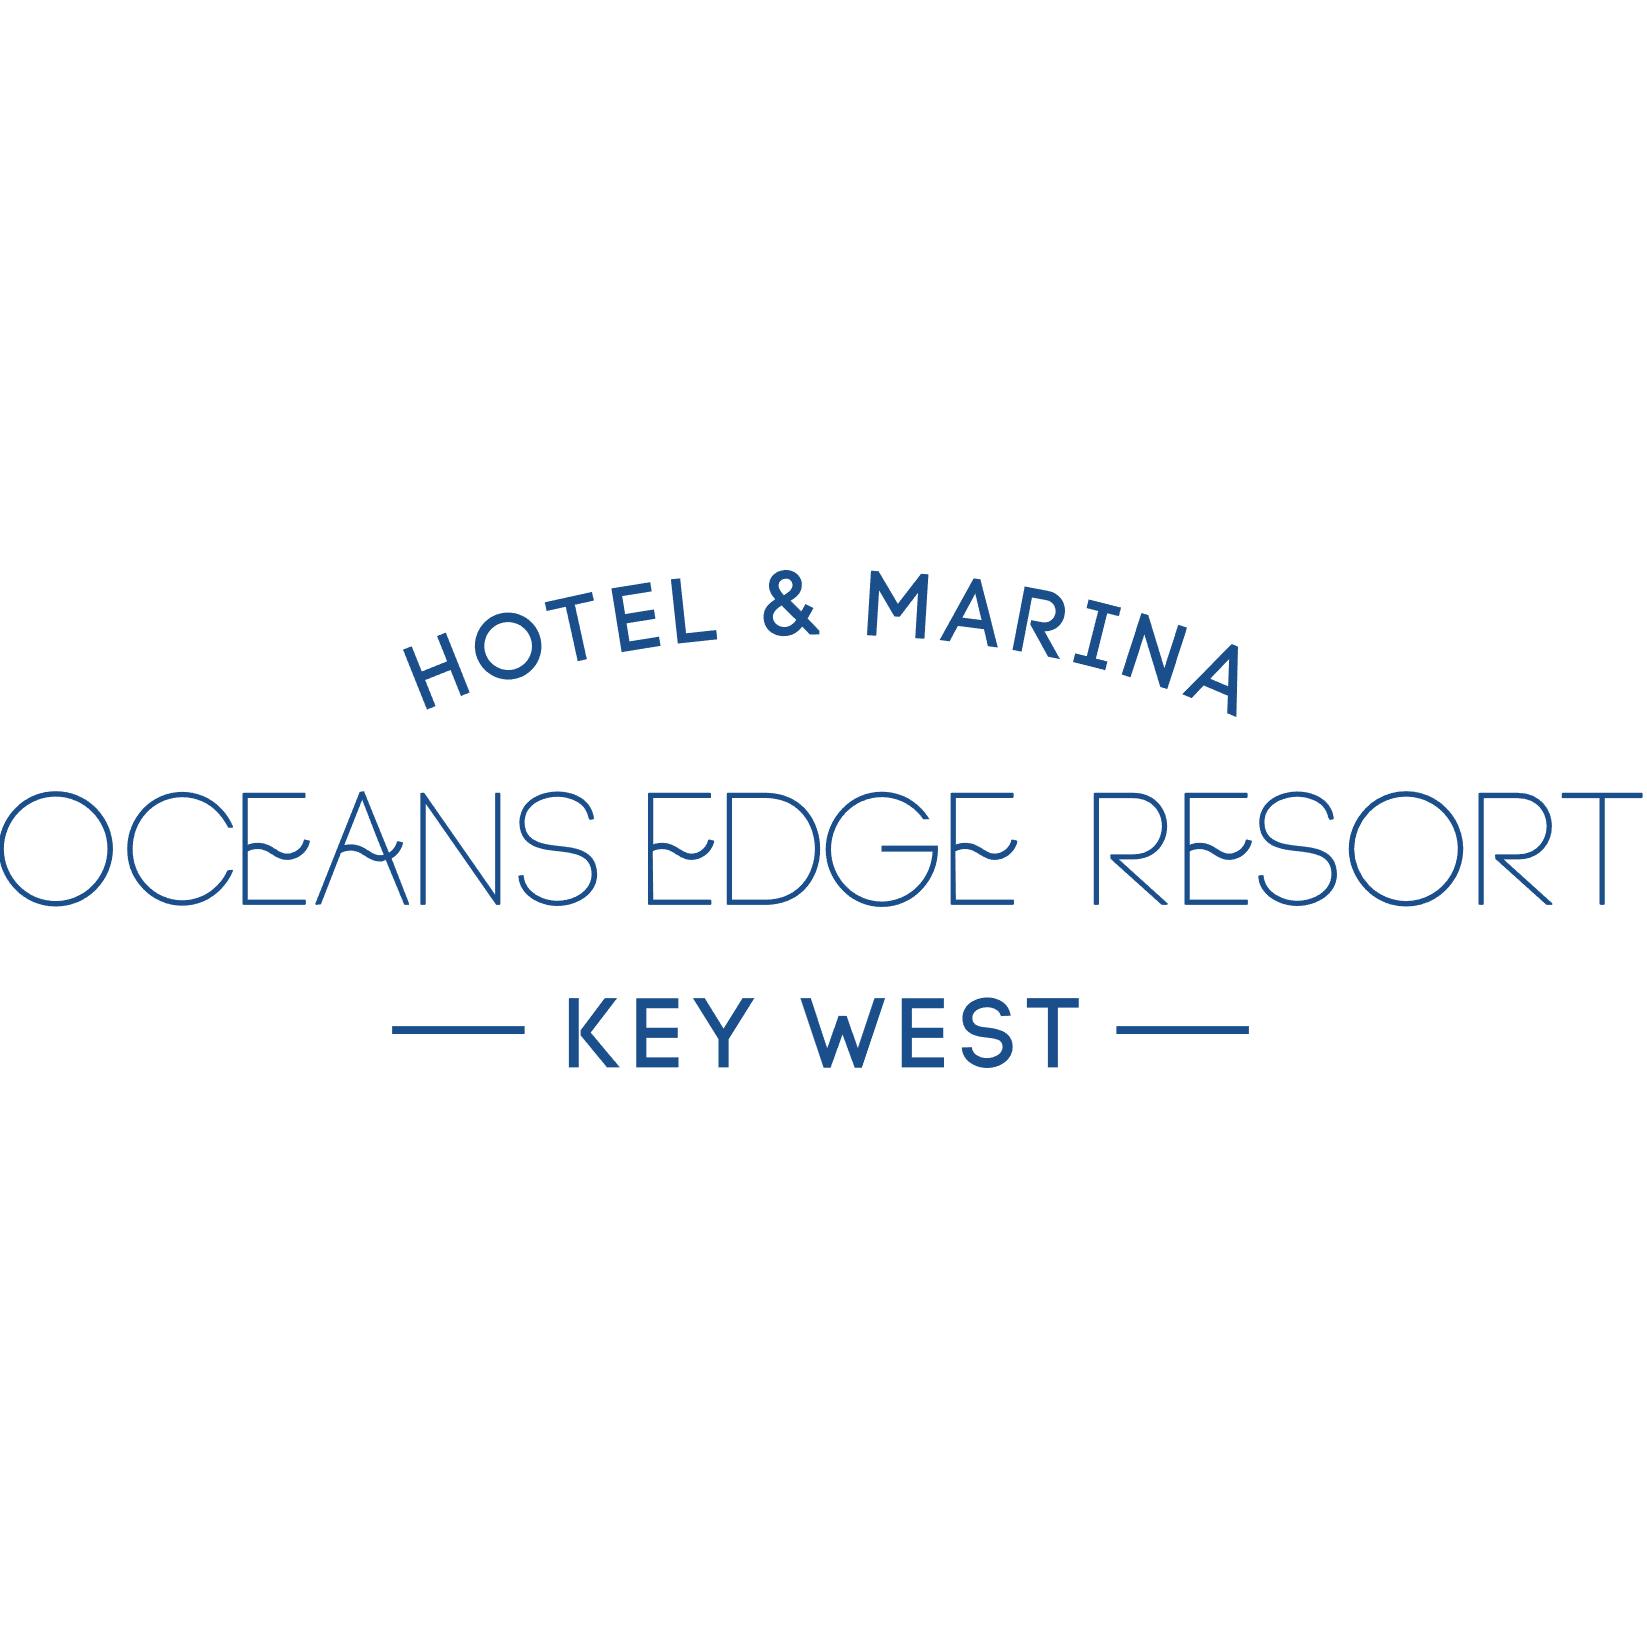 Oceans Edge Key West Resort Hotel & Marina image 6